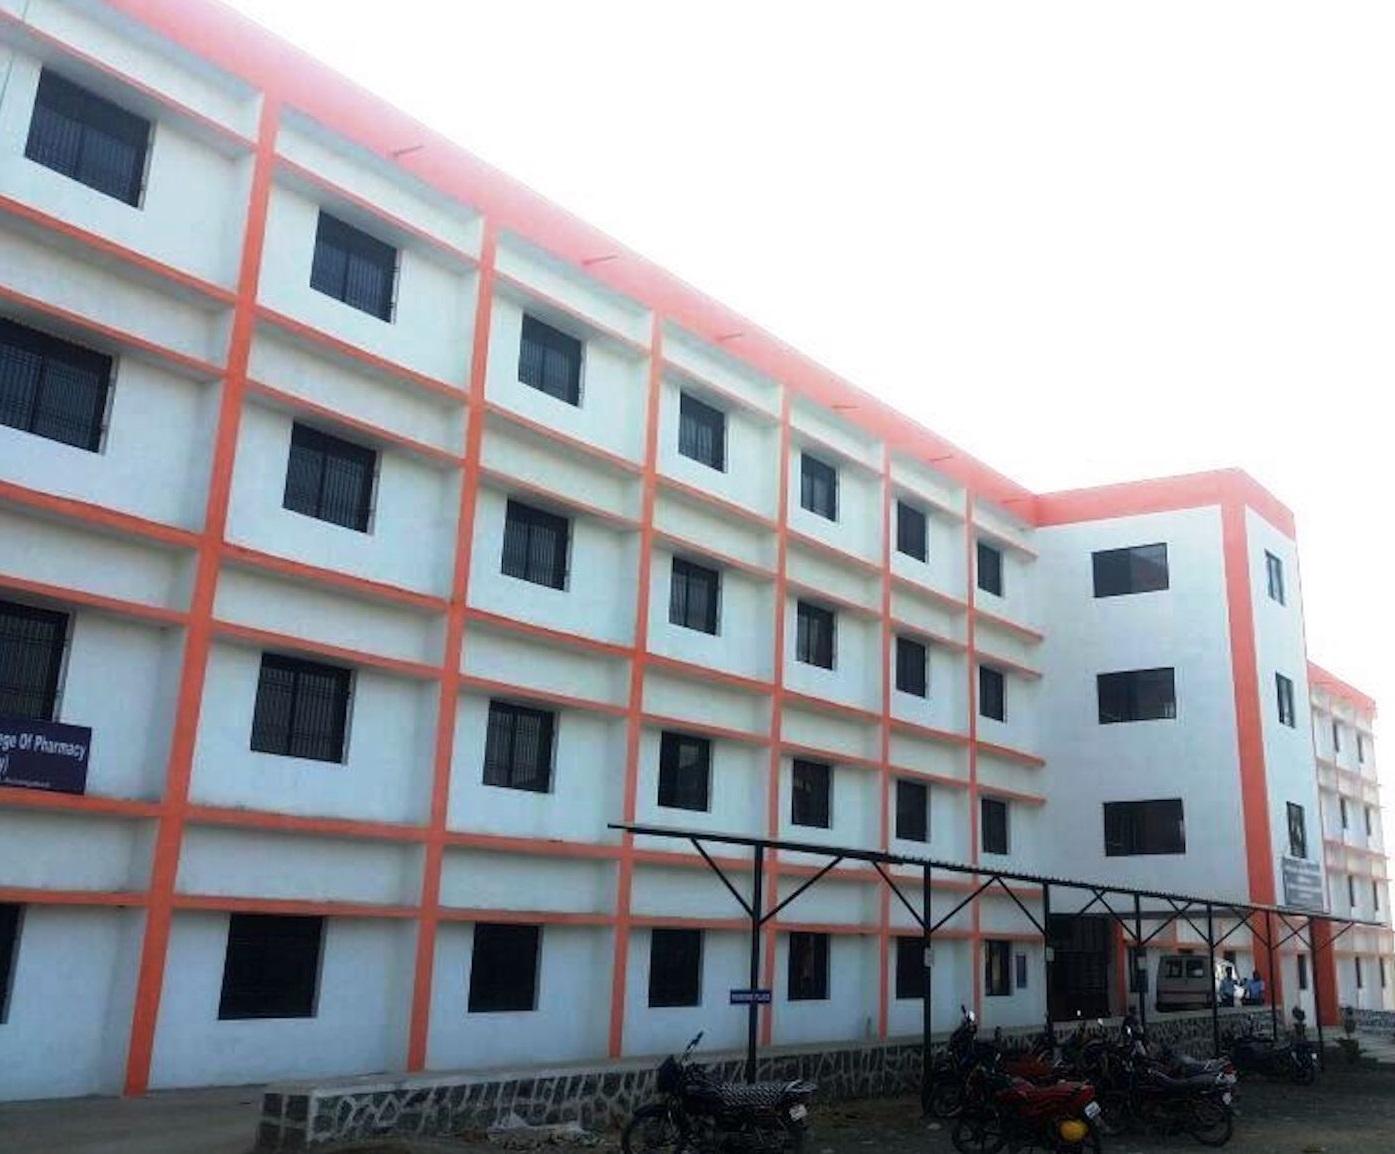 Bharatratna Dr. A.P.J. Abdul Kalam College Of Architecture, Aurangabad